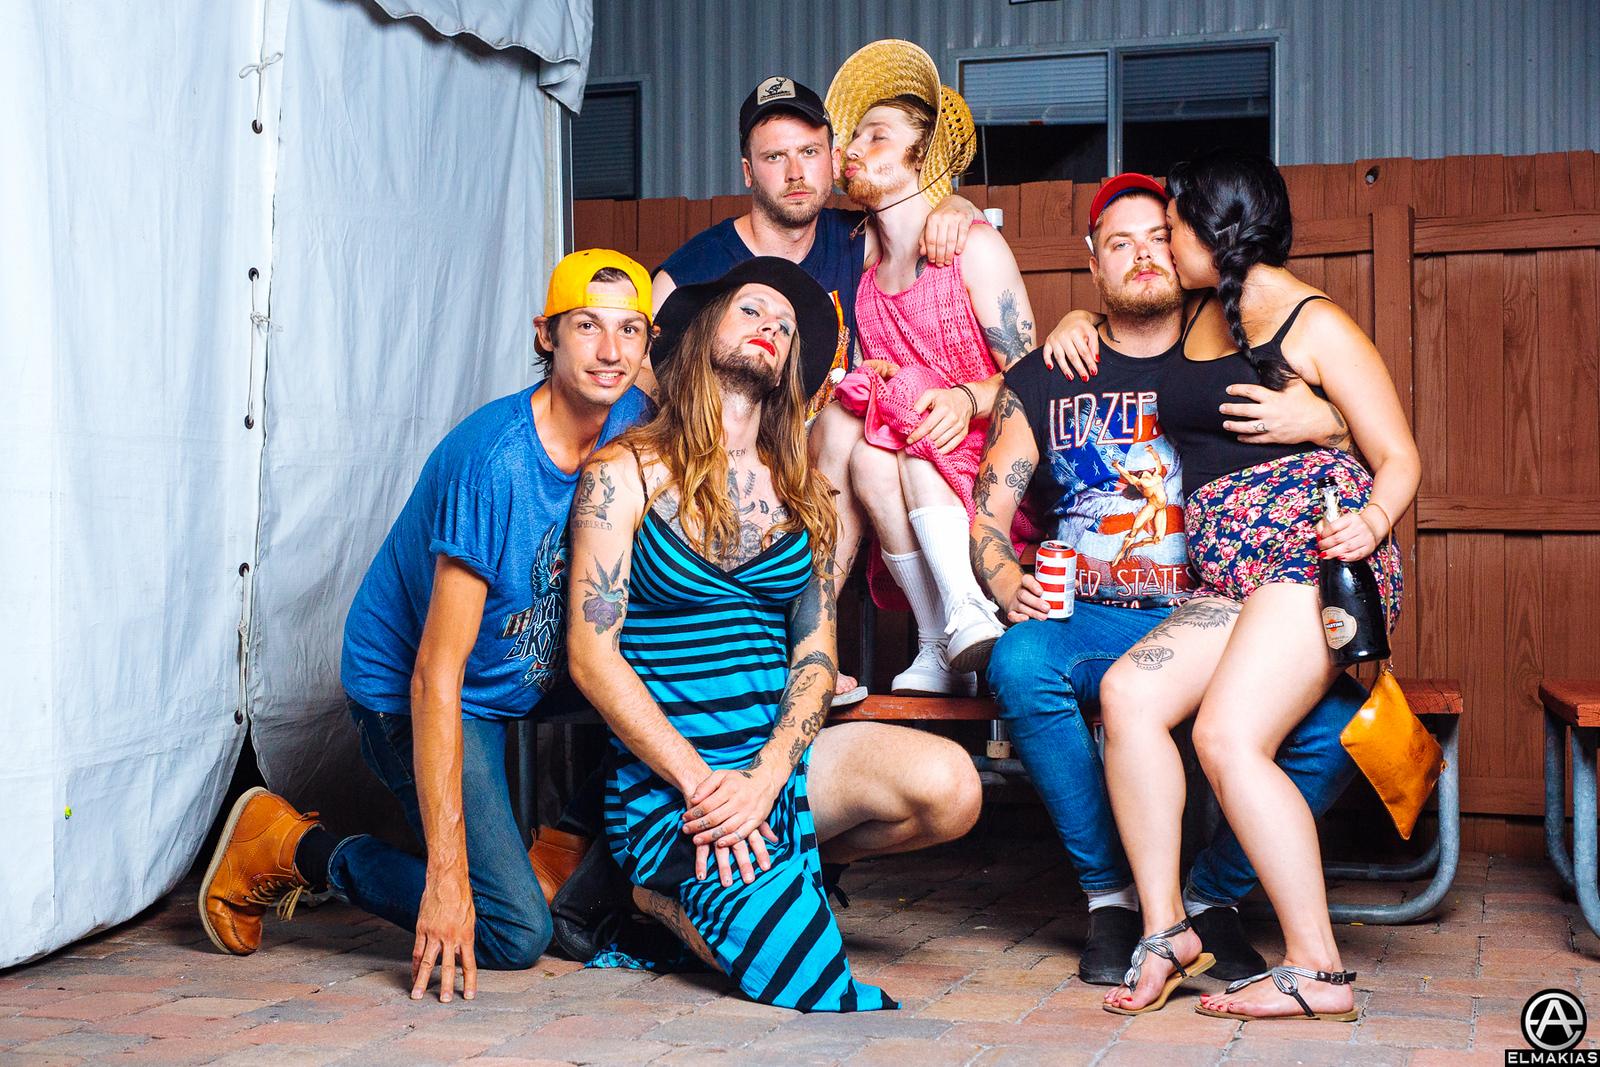 While She Sleeps at Warped Tour 2015 by Adam Elmakias